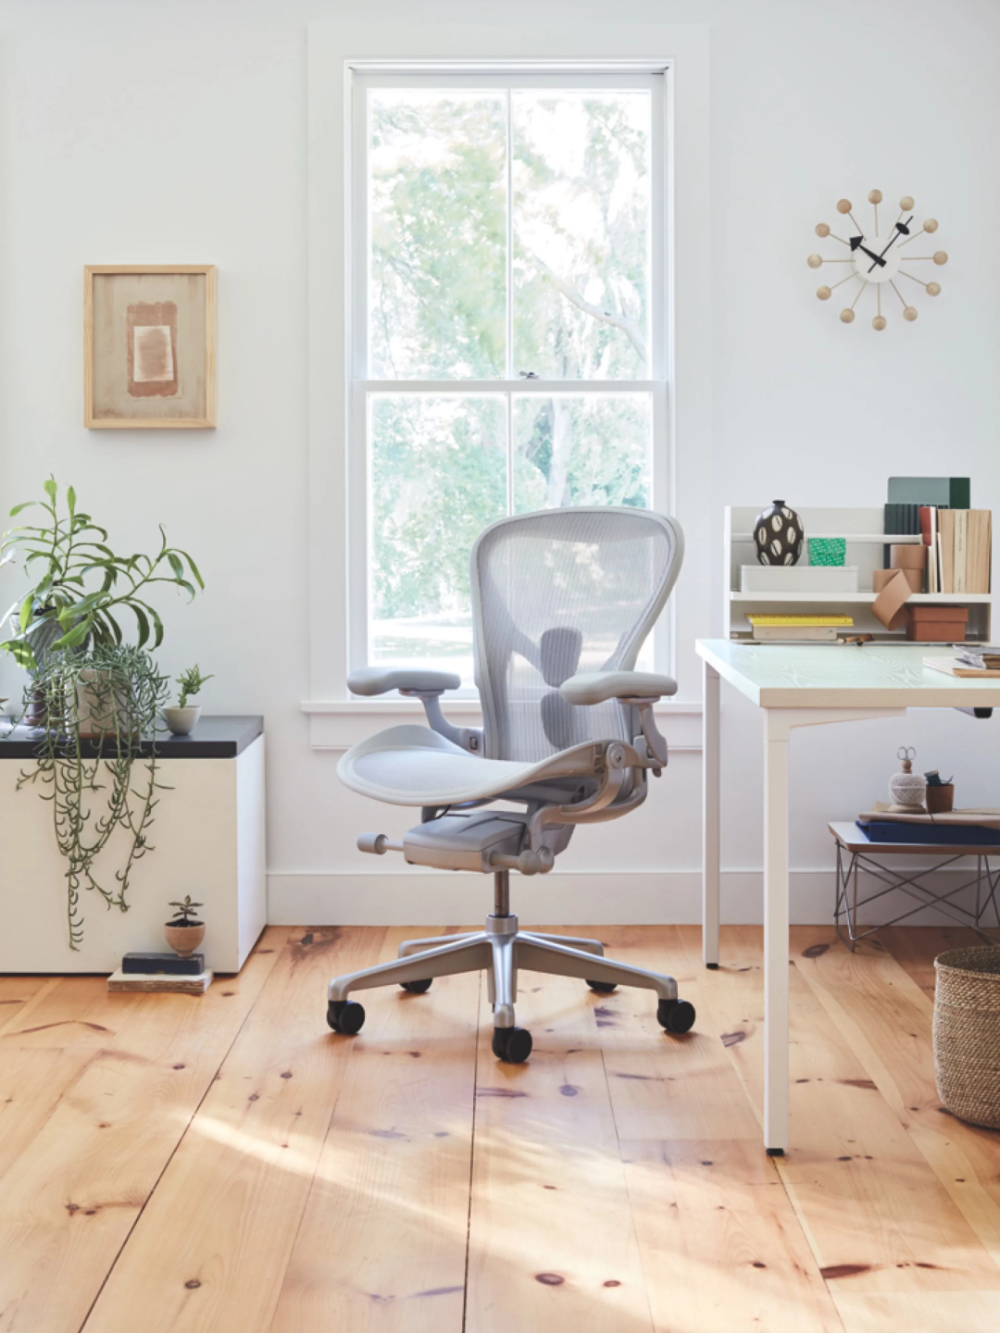 Aeron Chair in 2020 Aeron chairs, Herman miller